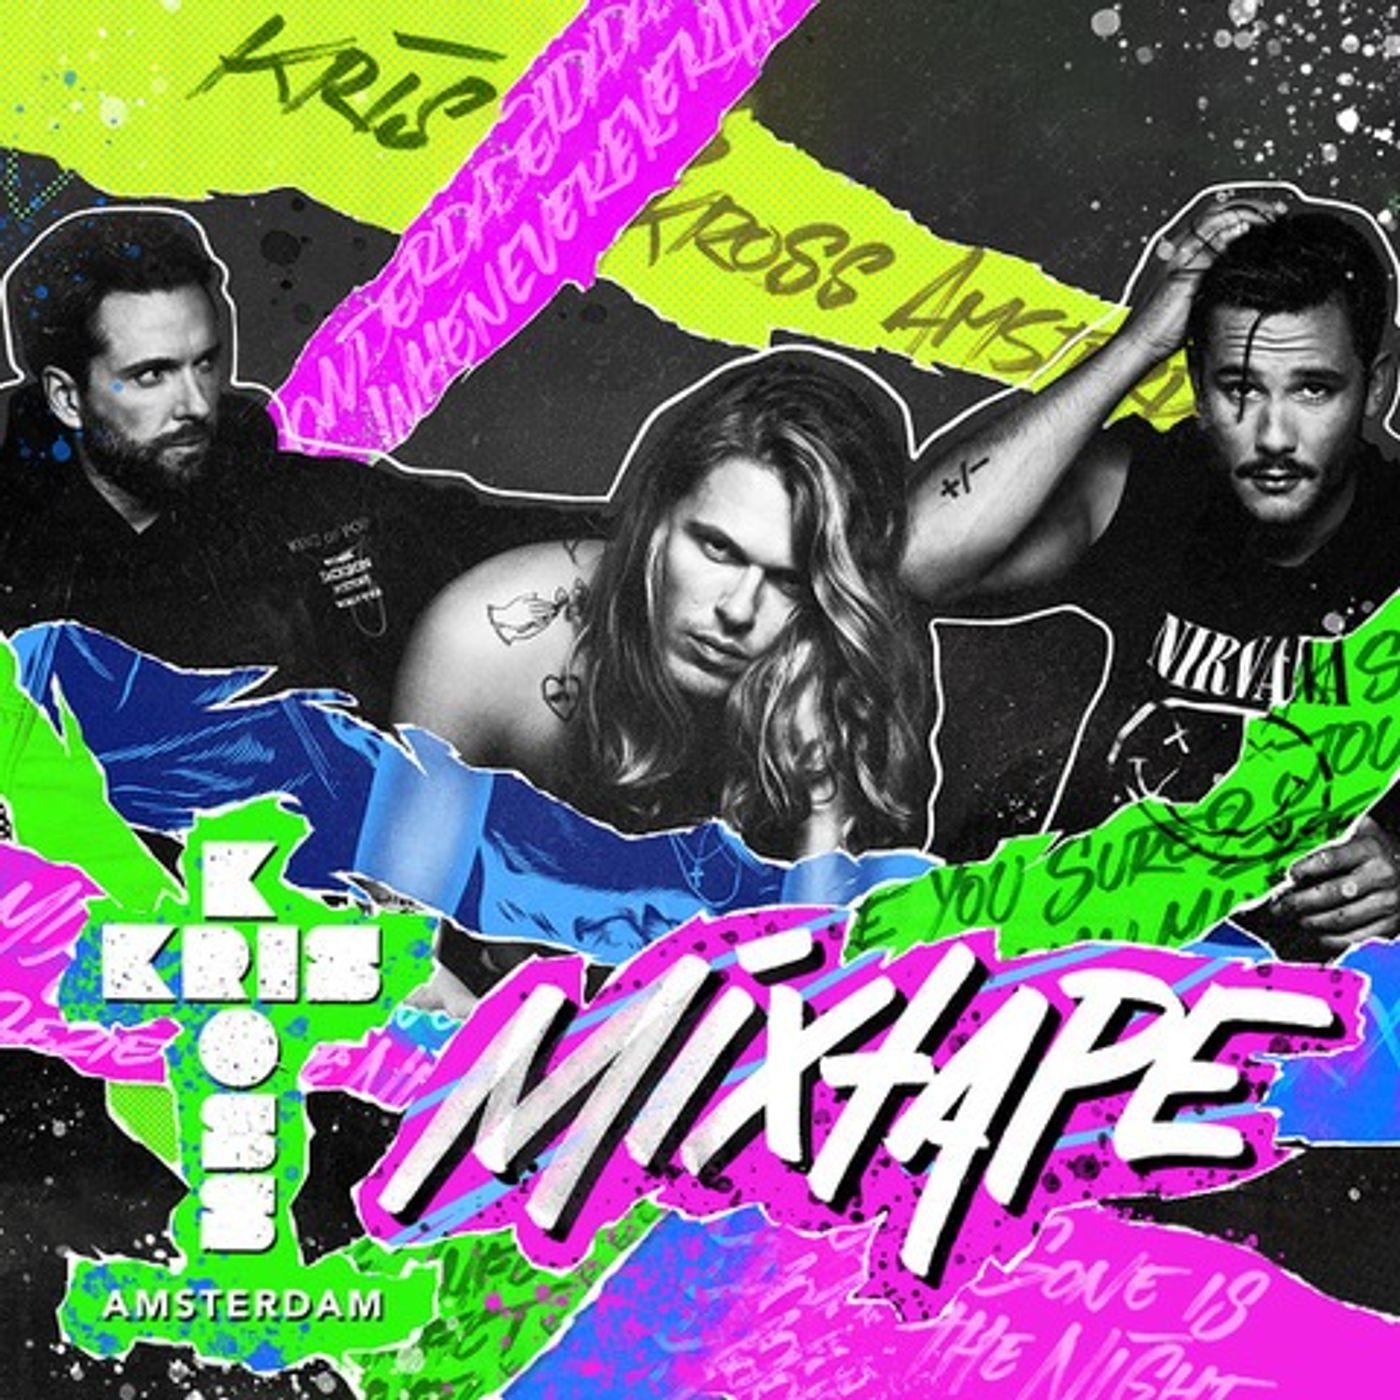 Kris Kross Amsterdam | Kris Kross Mixtape #117